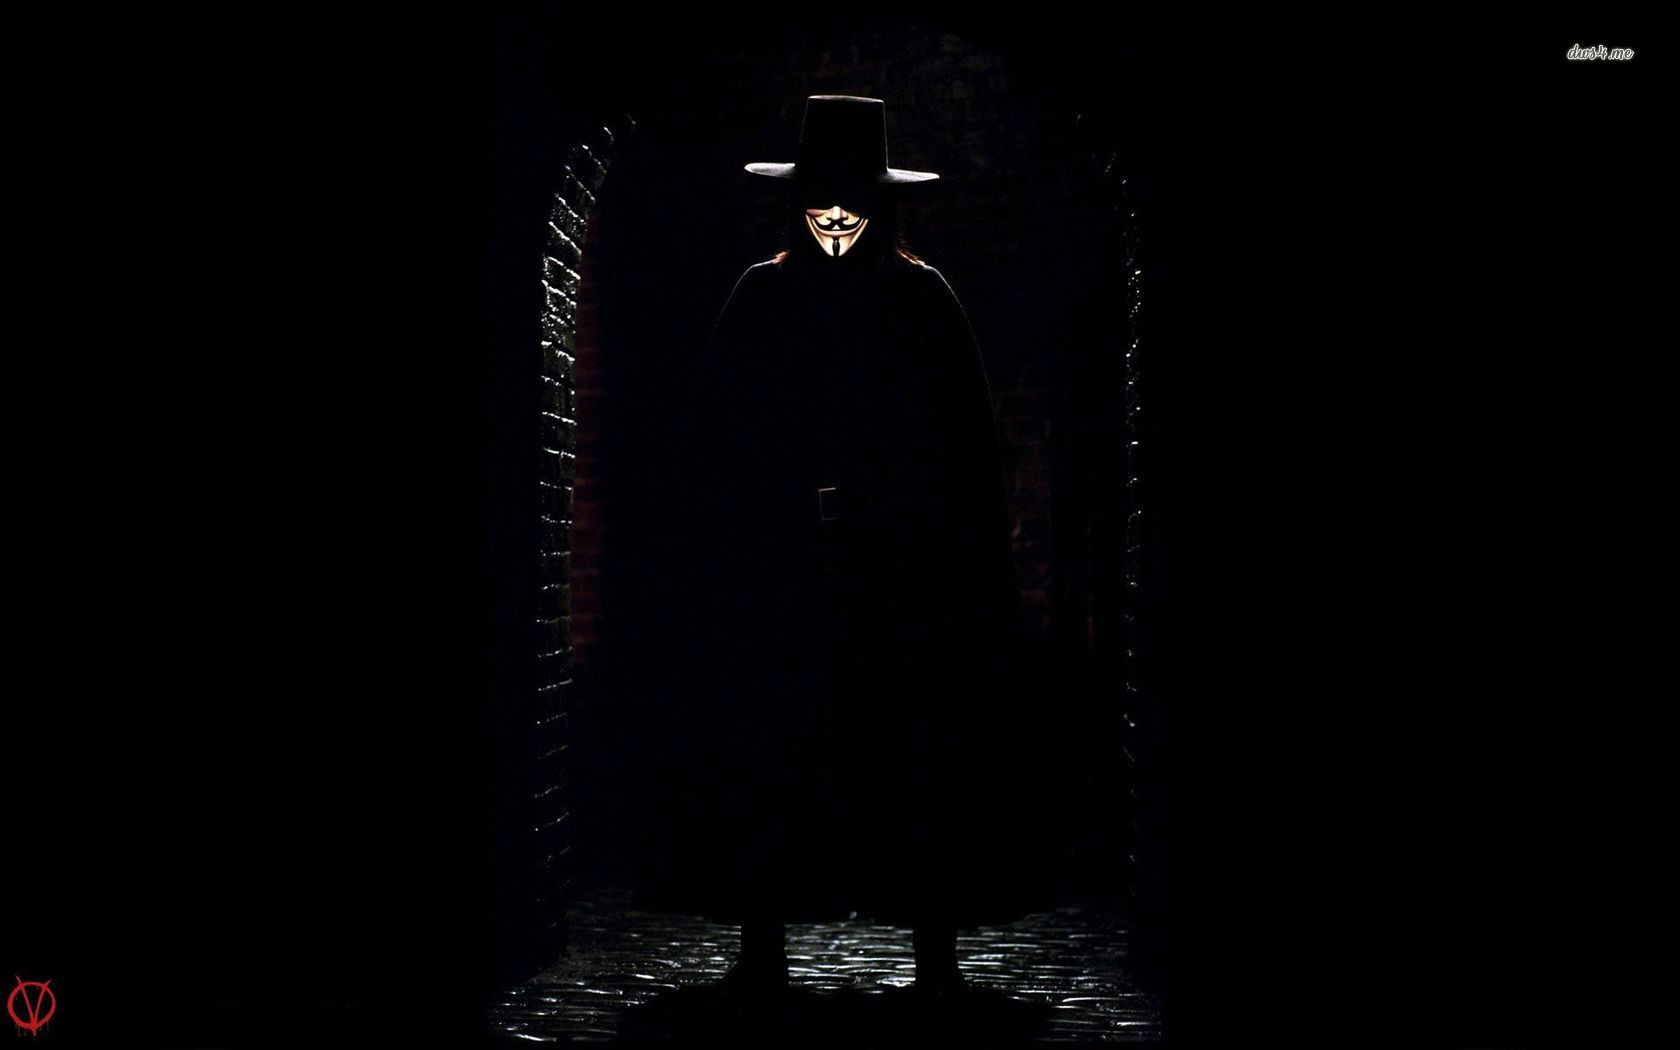 V For Vendetta Movie Wallpaper Scary V For Vendetta Q...